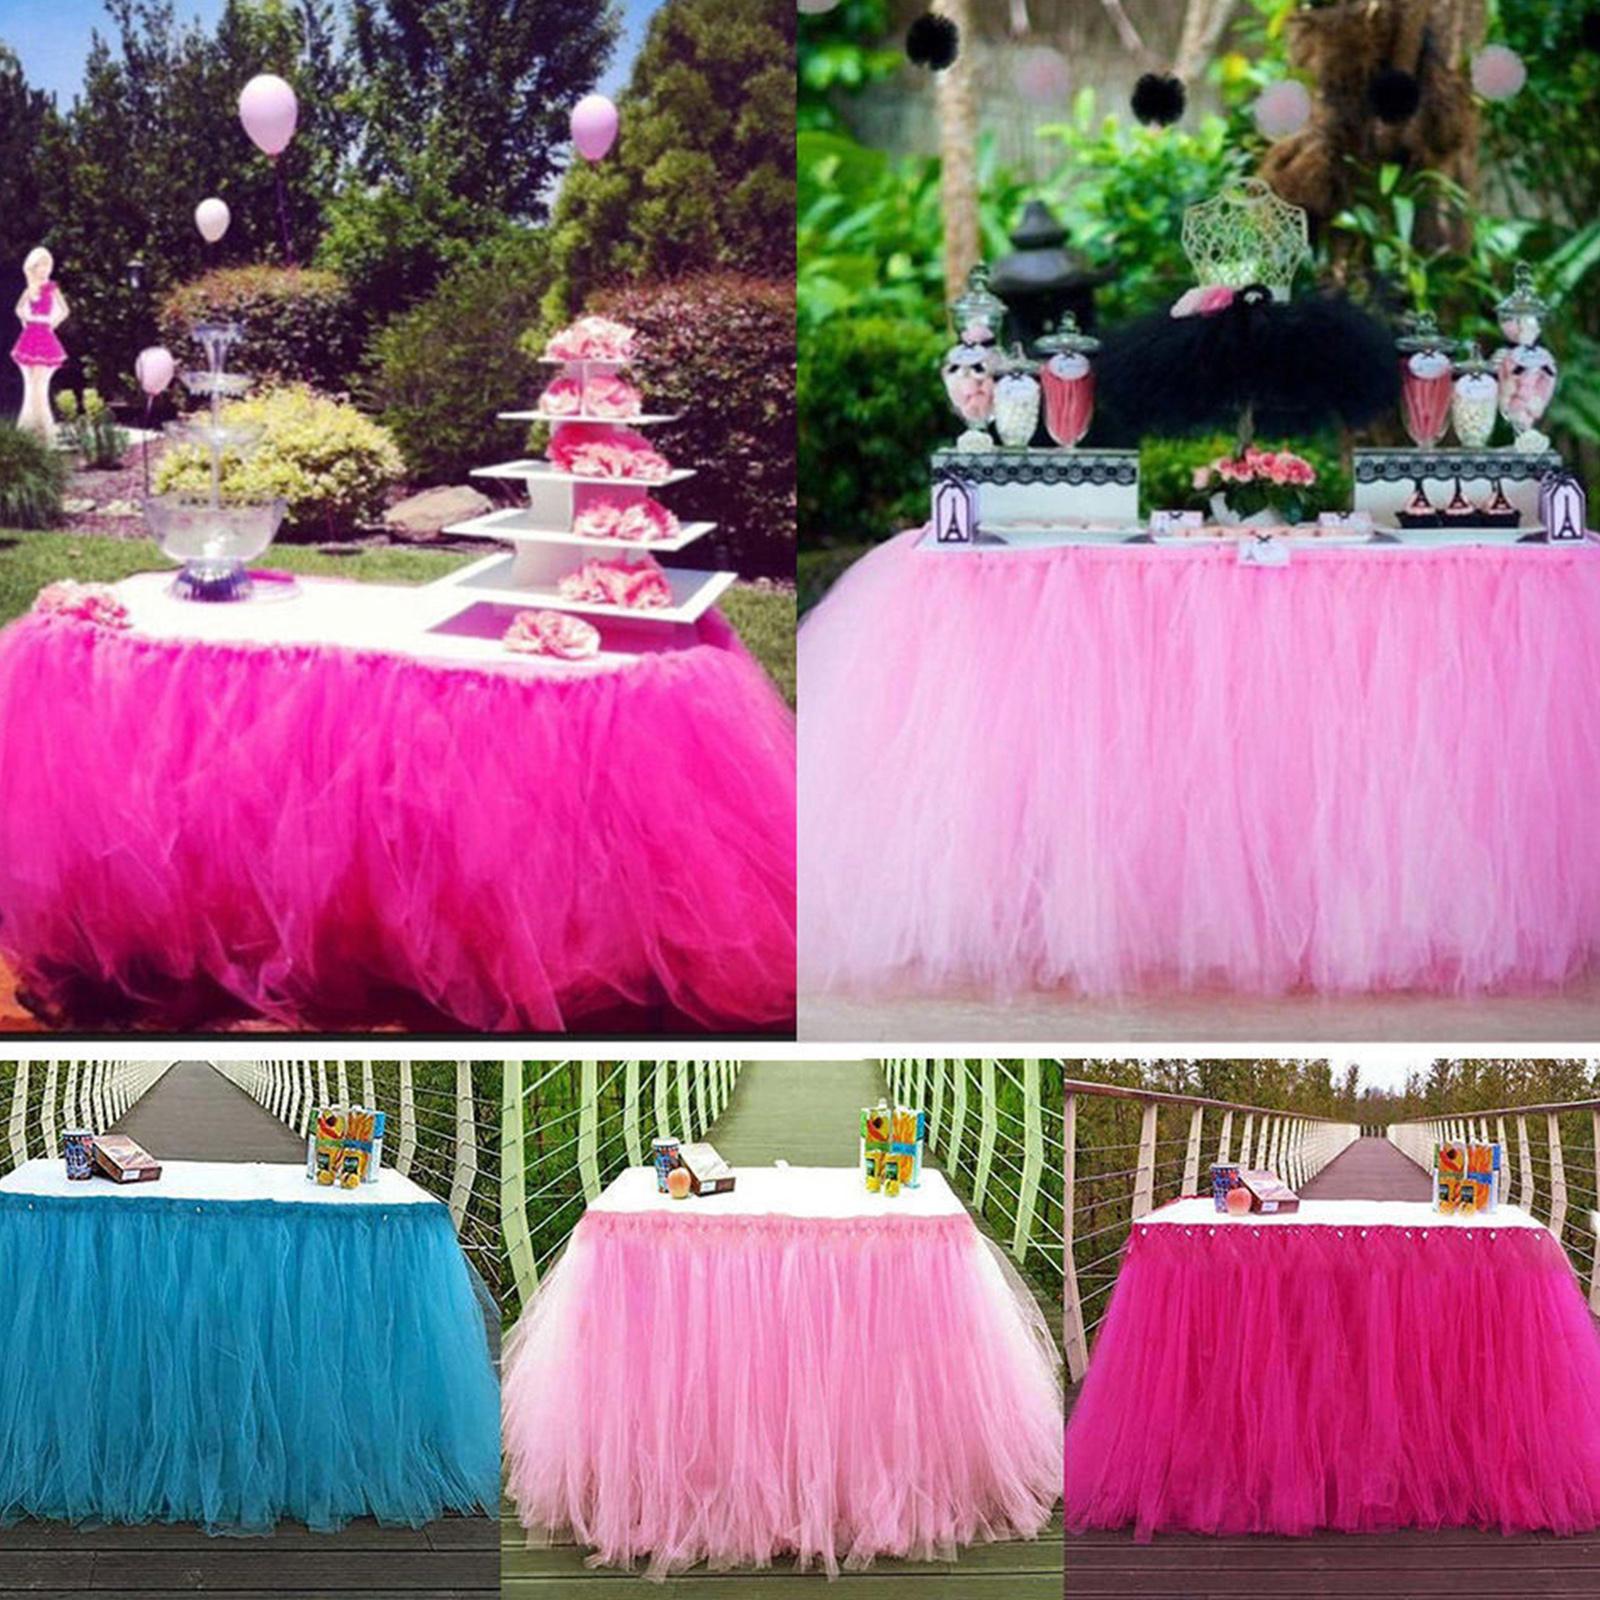 Wedding Party Tulle Tutu Table Skirt Tableware Birthday Baby Shower